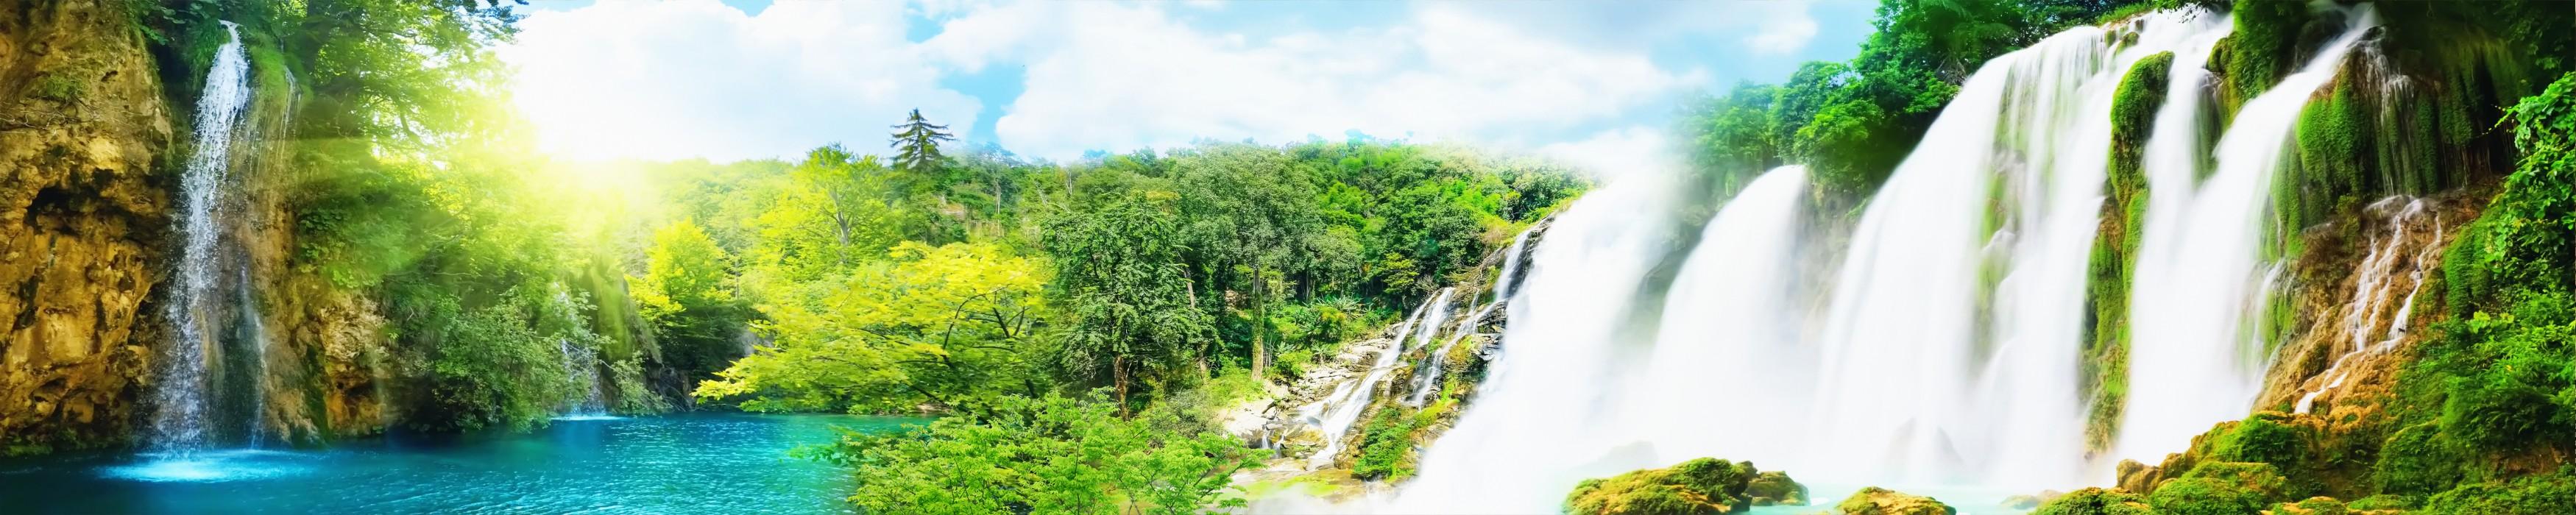 Водопады панорамы картинки